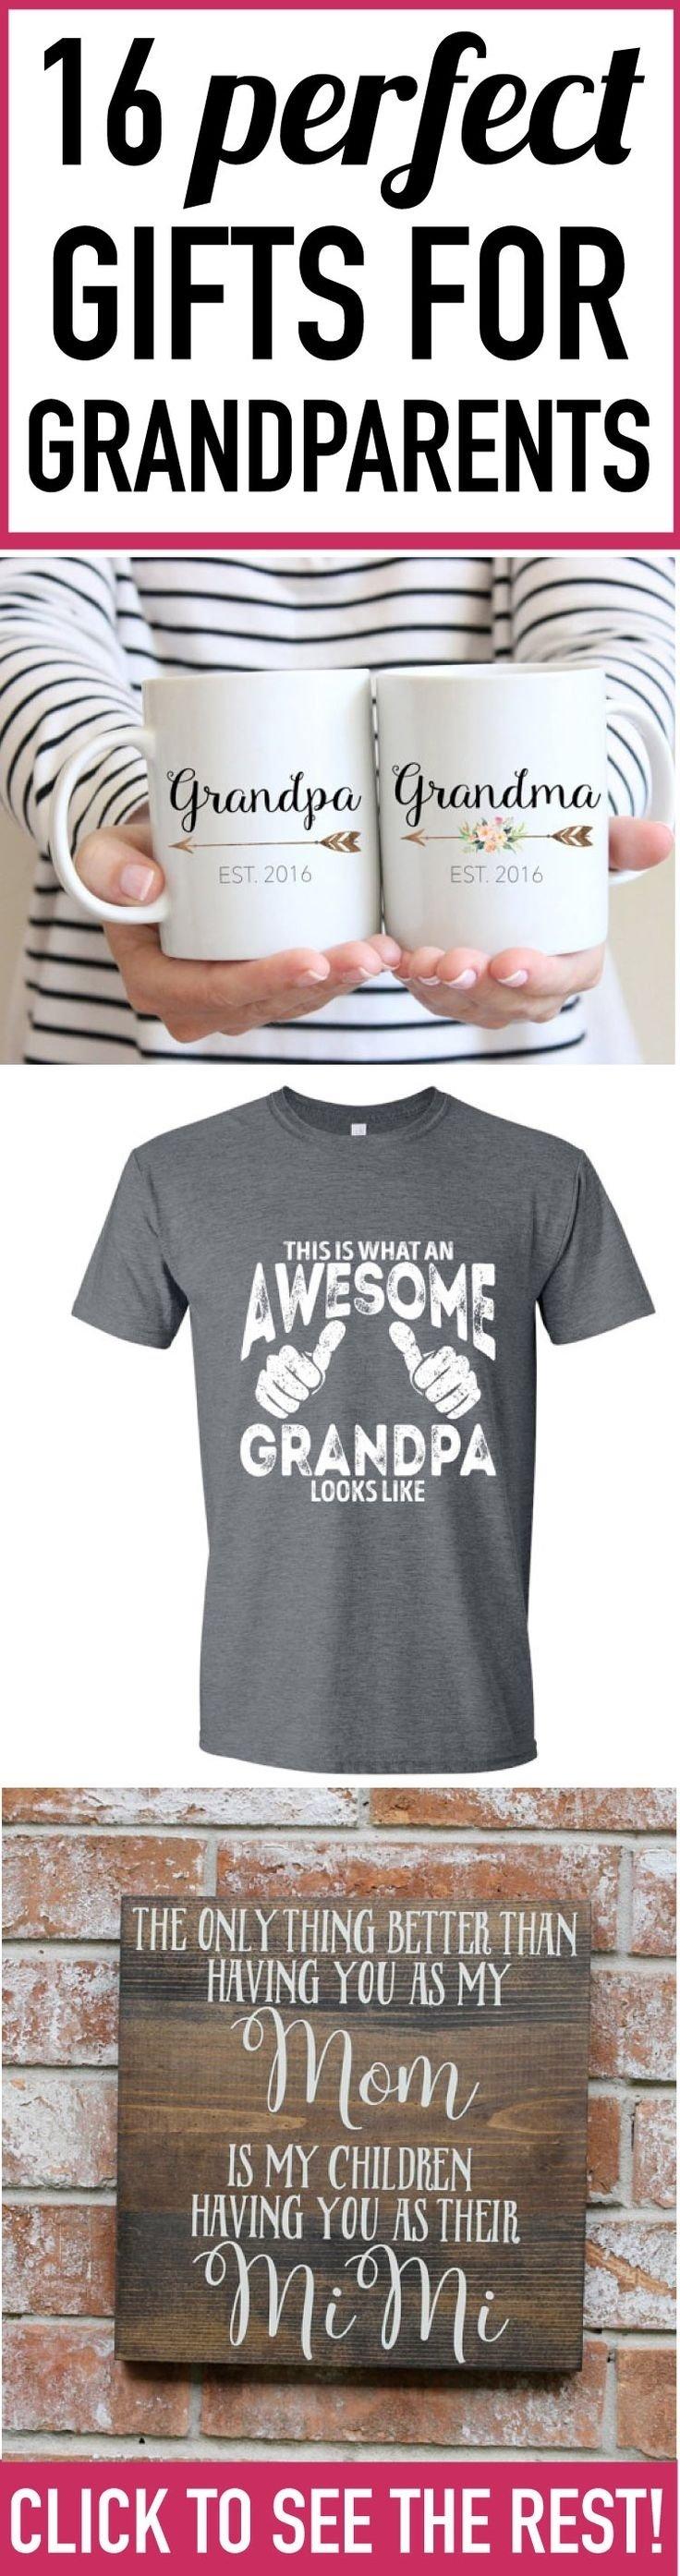 10 Unique Christmas Present Ideas For Grandma